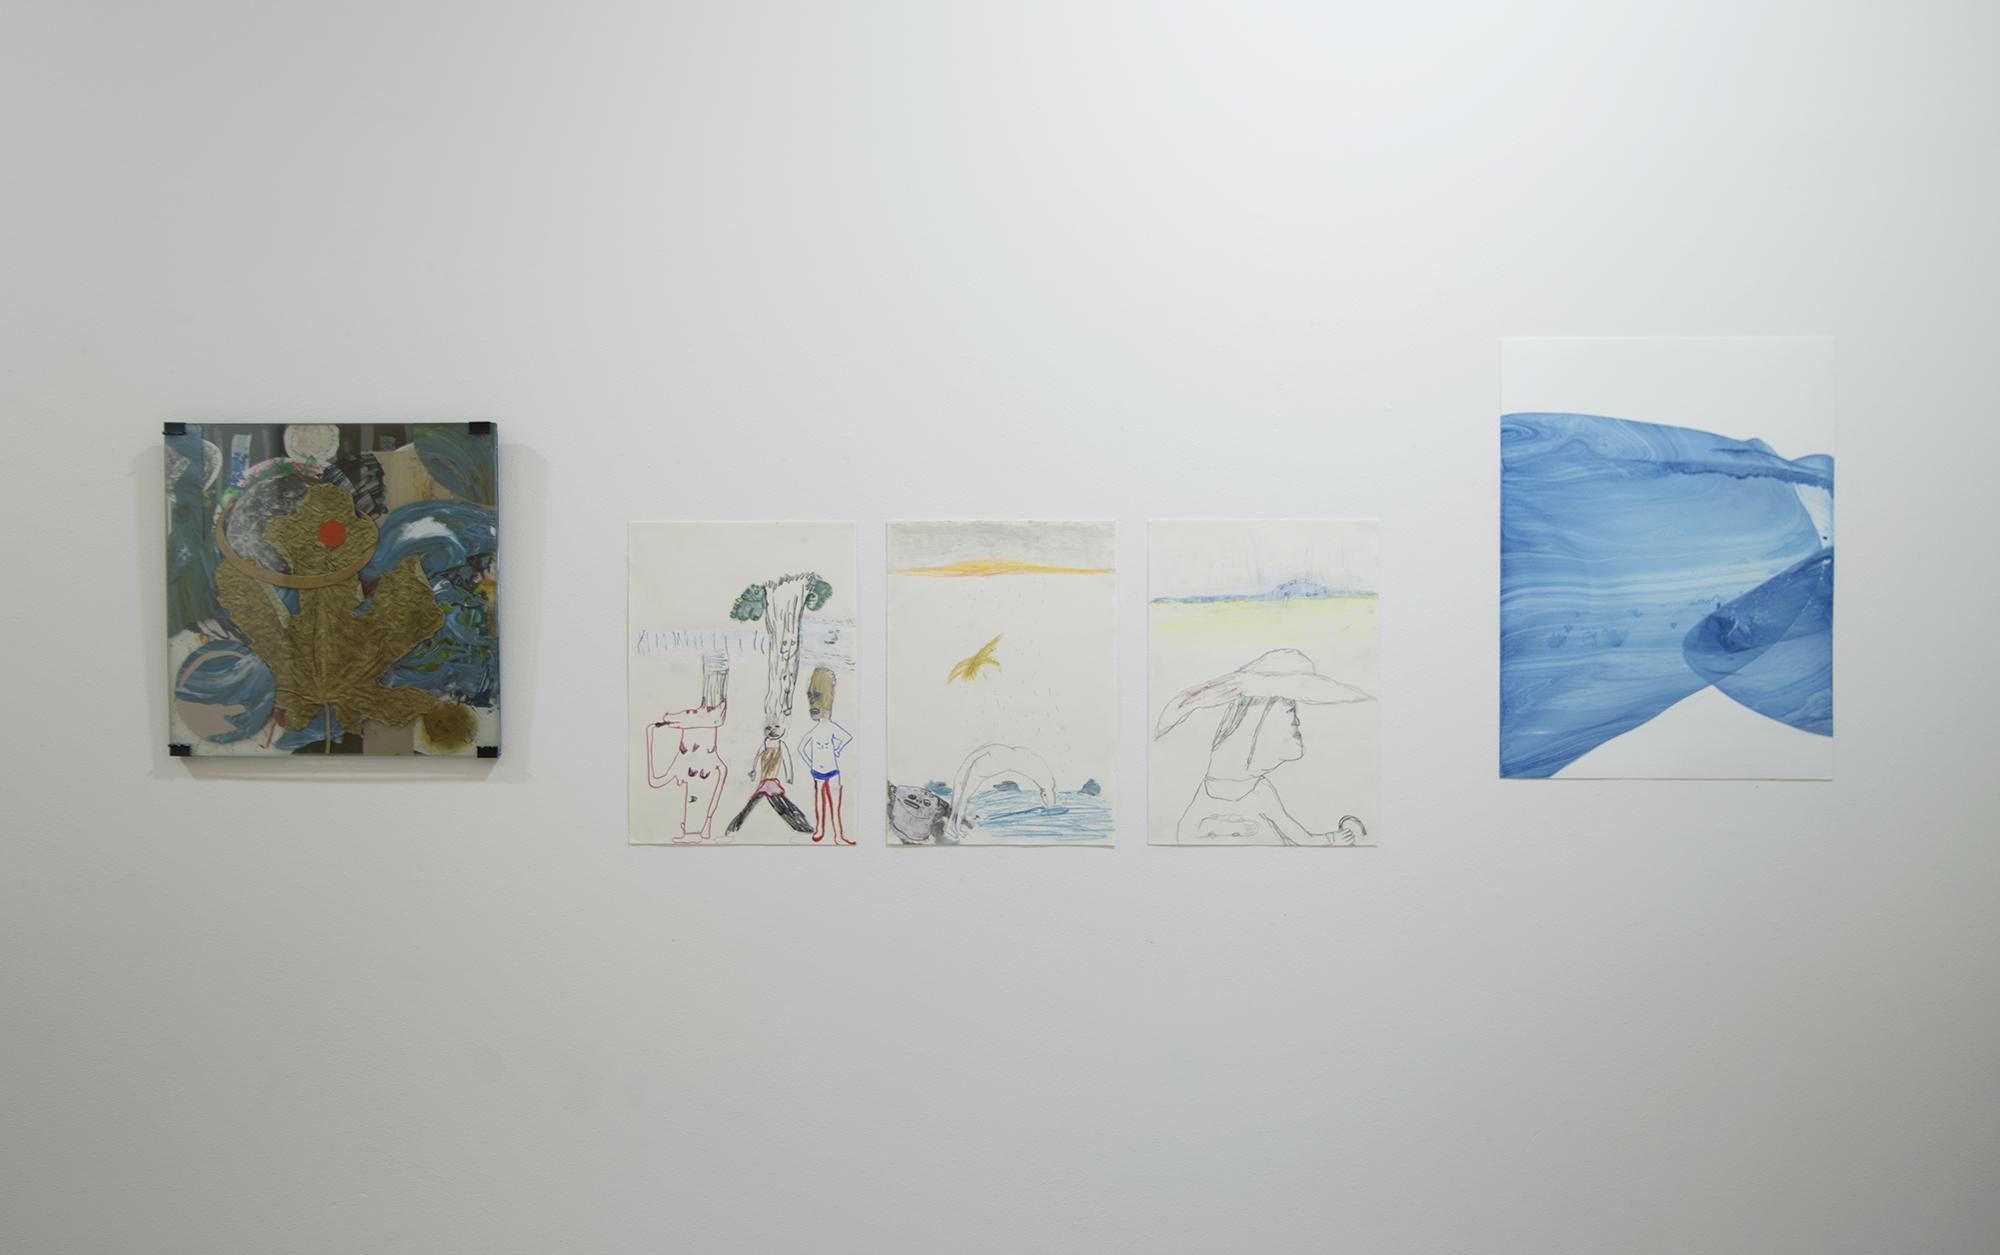 Colby Cannon Welsh / Janne Räisänen (3 drawings) / Tanja Hehmann